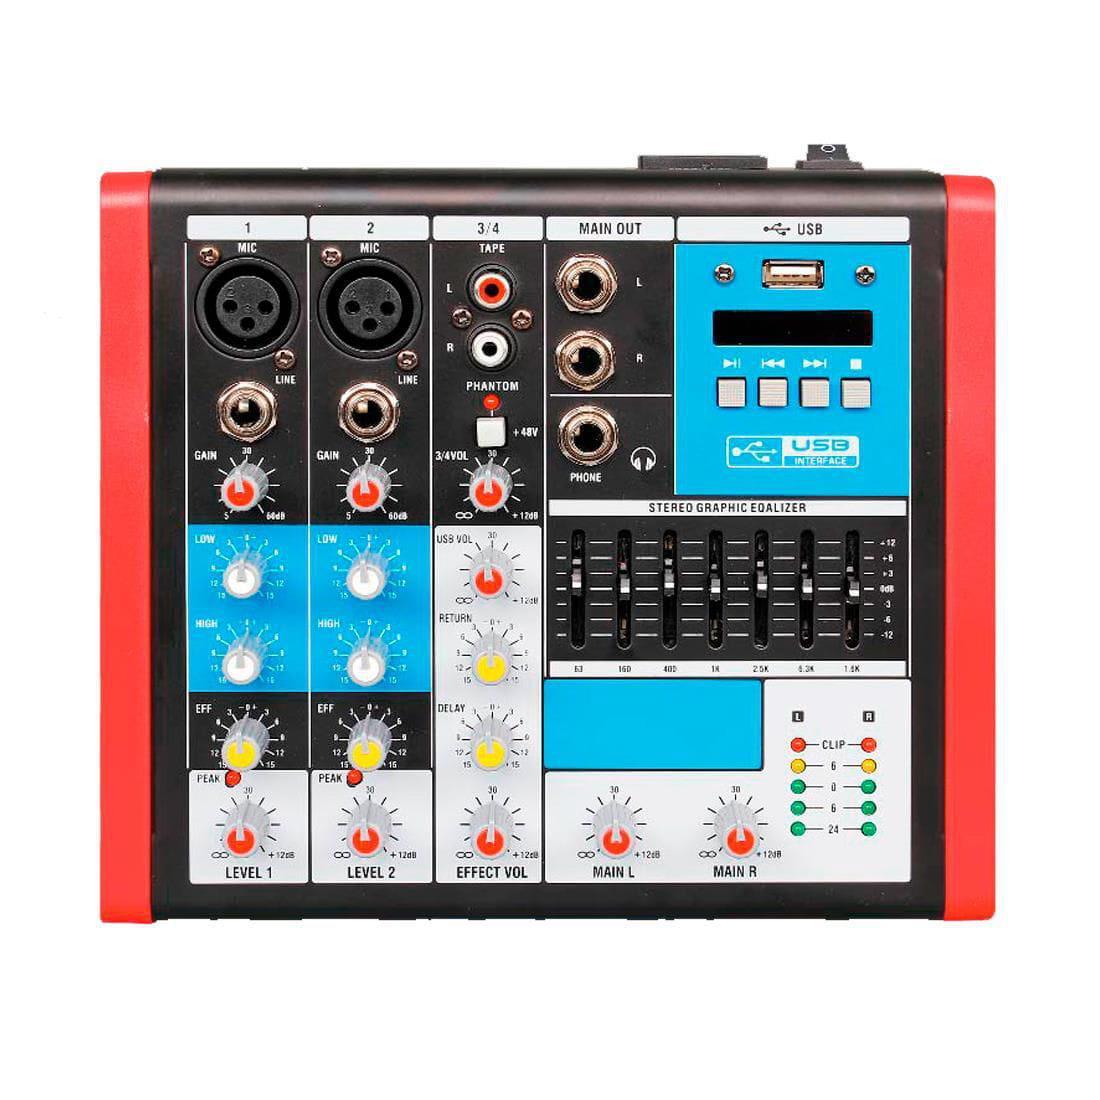 Mixer Compacta Soundvoice MC4EUX (4 Canais/Efeito/Equalizador/USB)